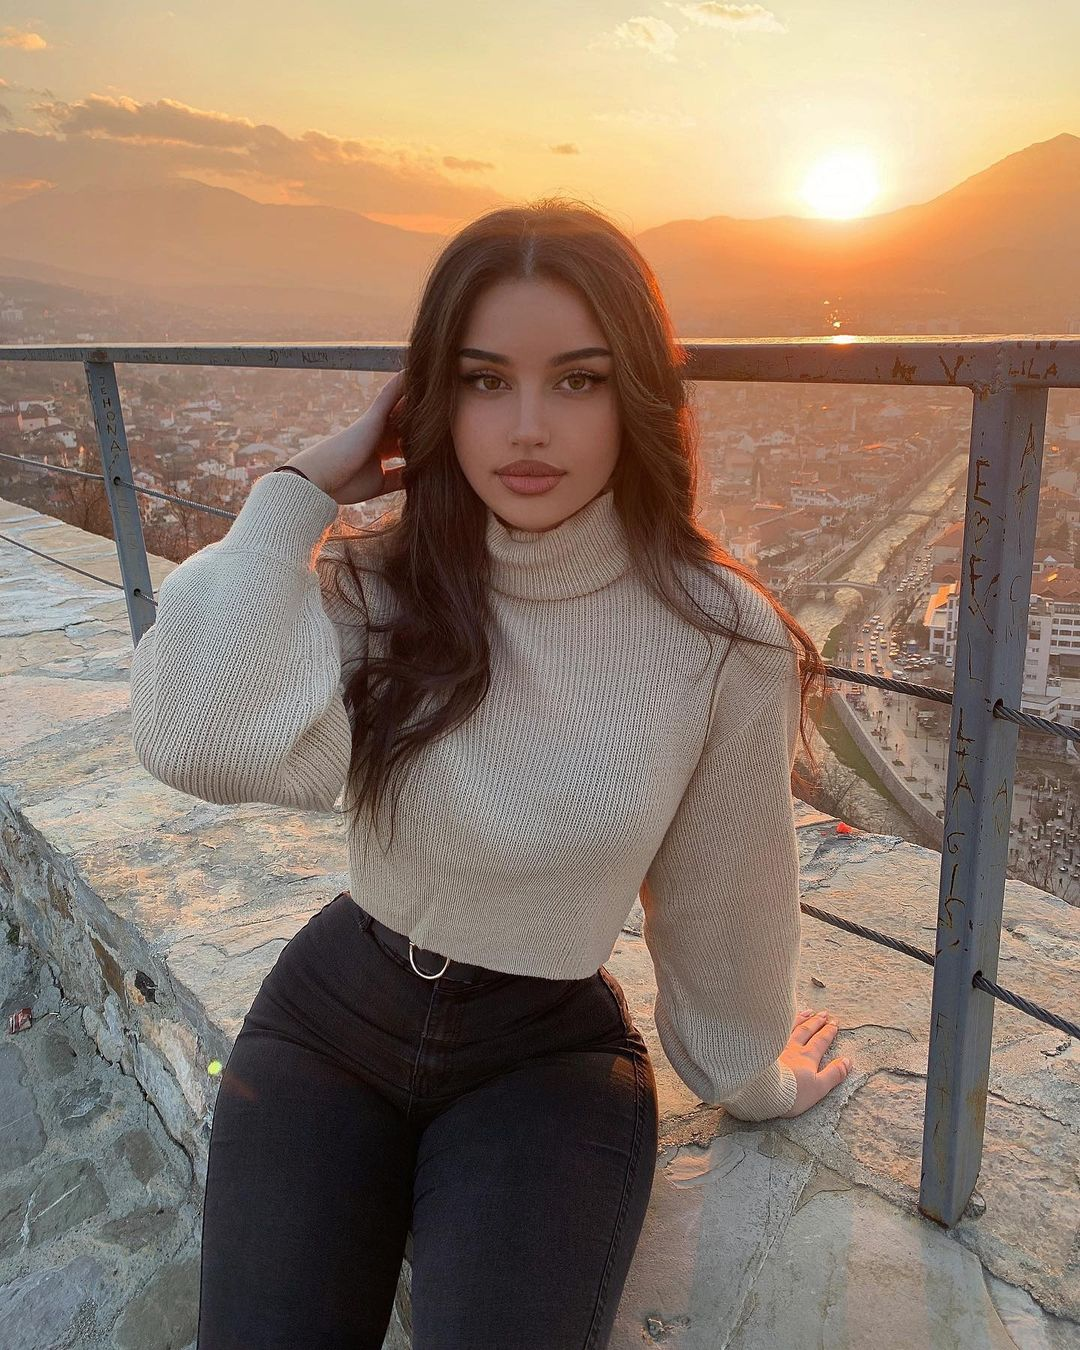 Leyla-Melina-Wallpapers-Insta-Fit-Bio-1